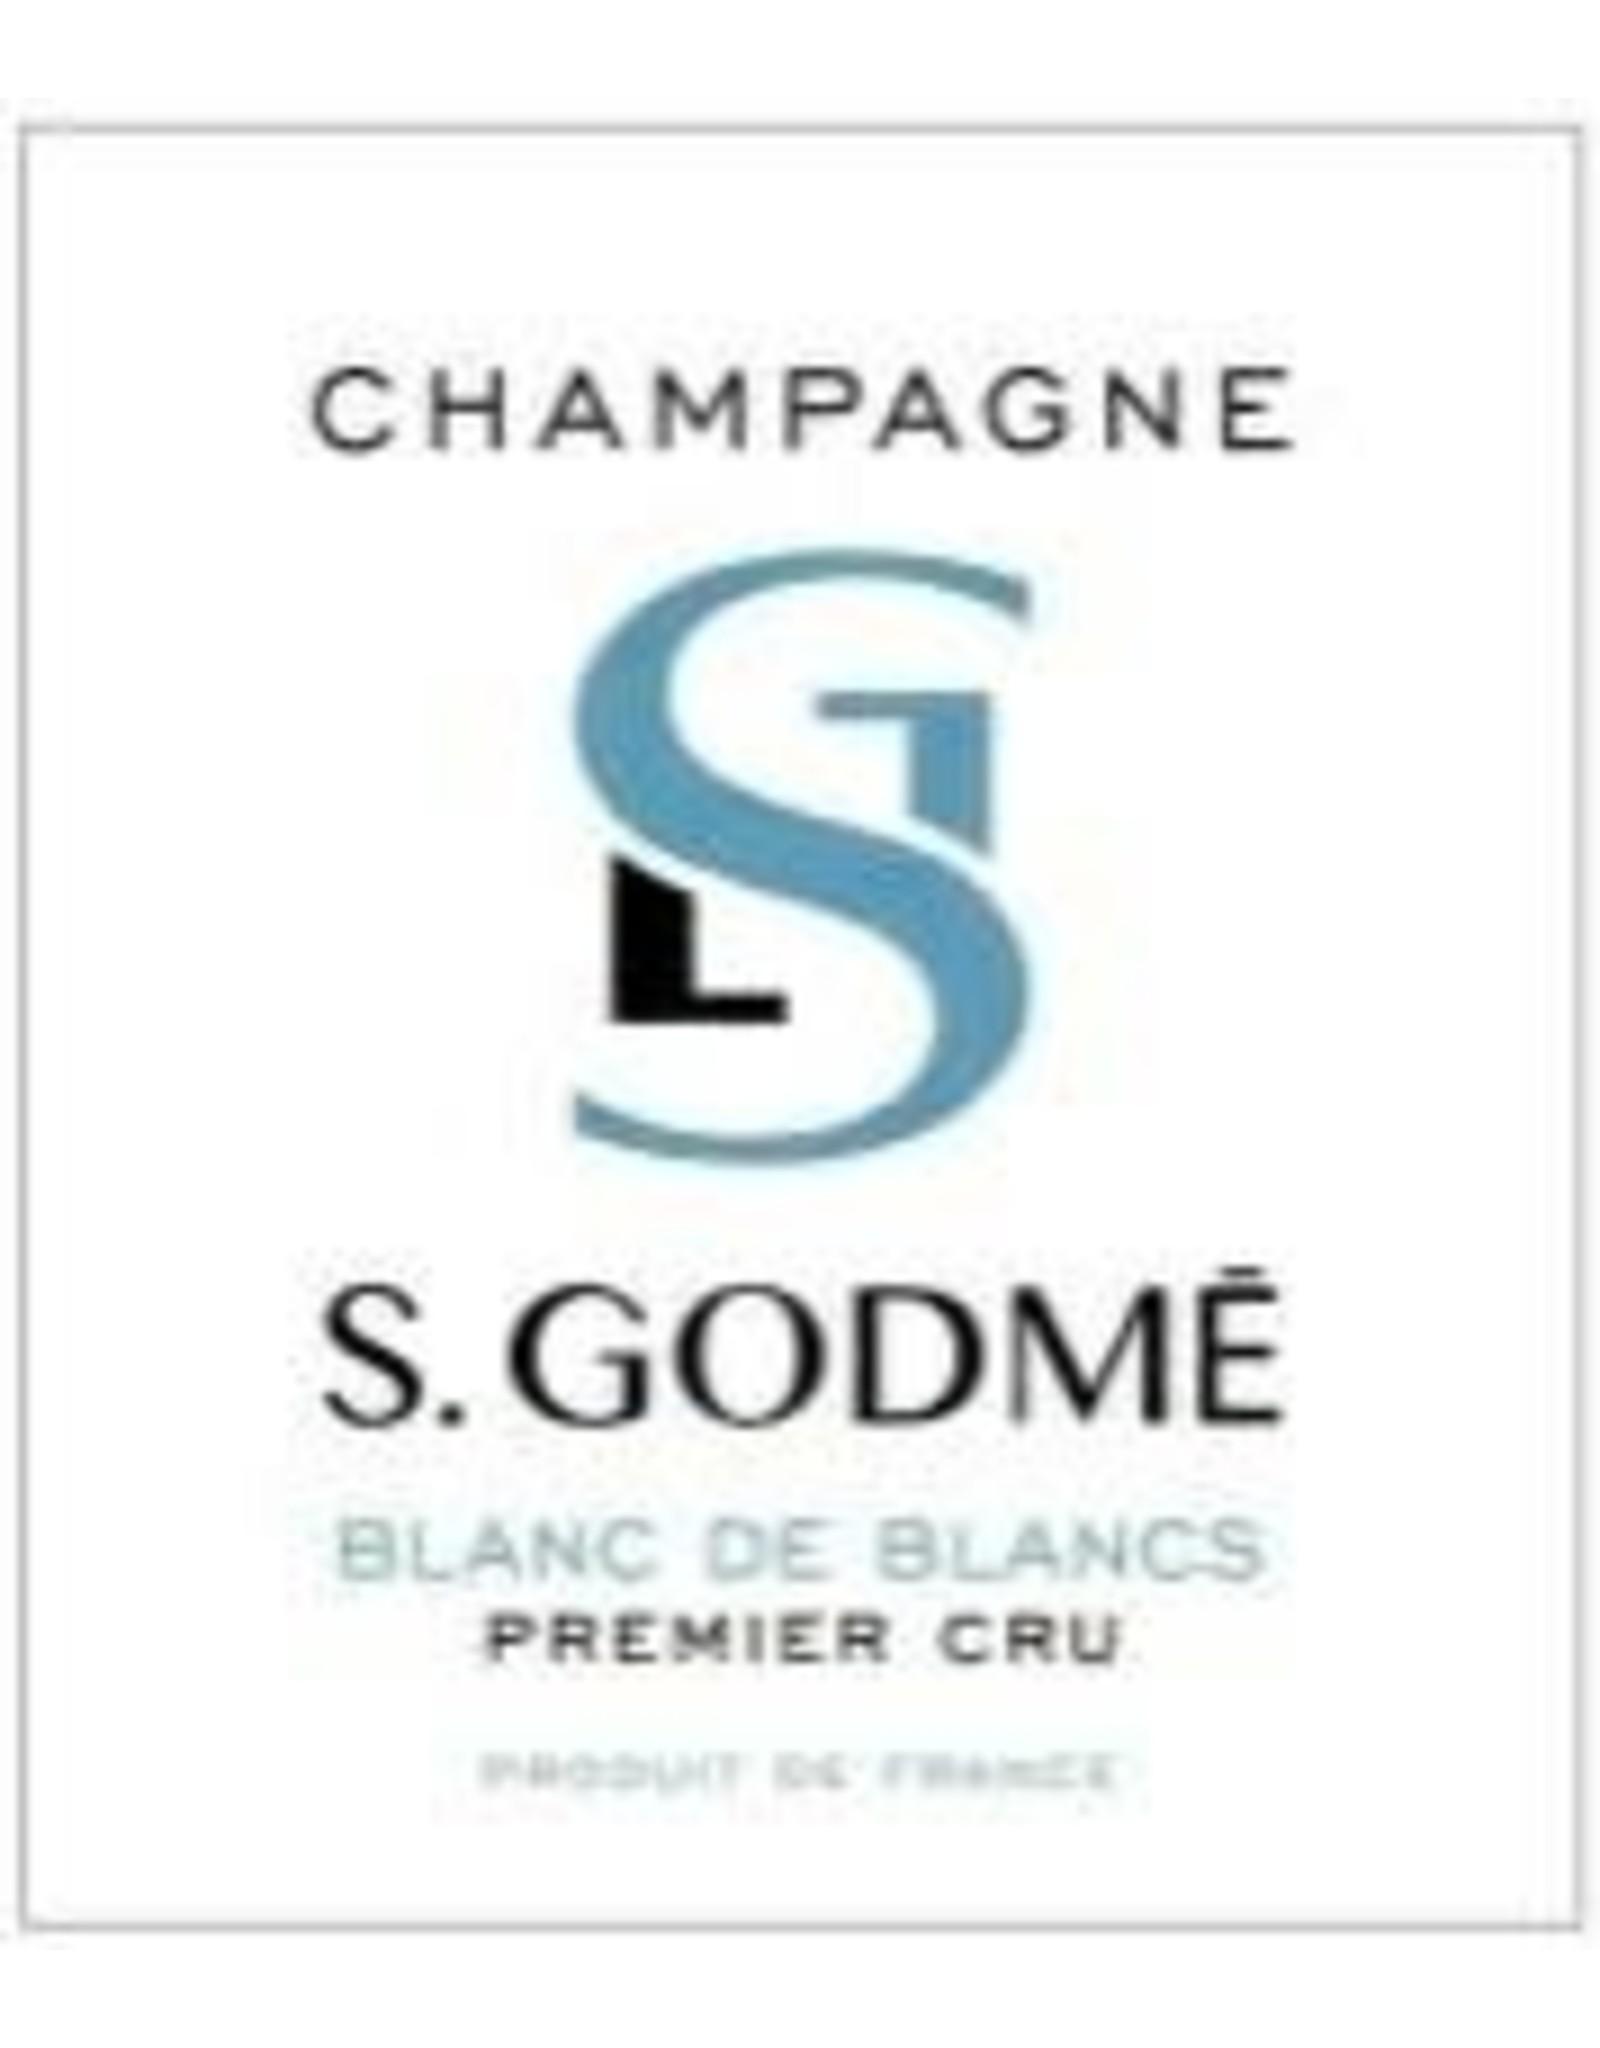 Sparkling - Champagne Sabine Godme Blanc de Blanc Brut Premier Cru Champagne